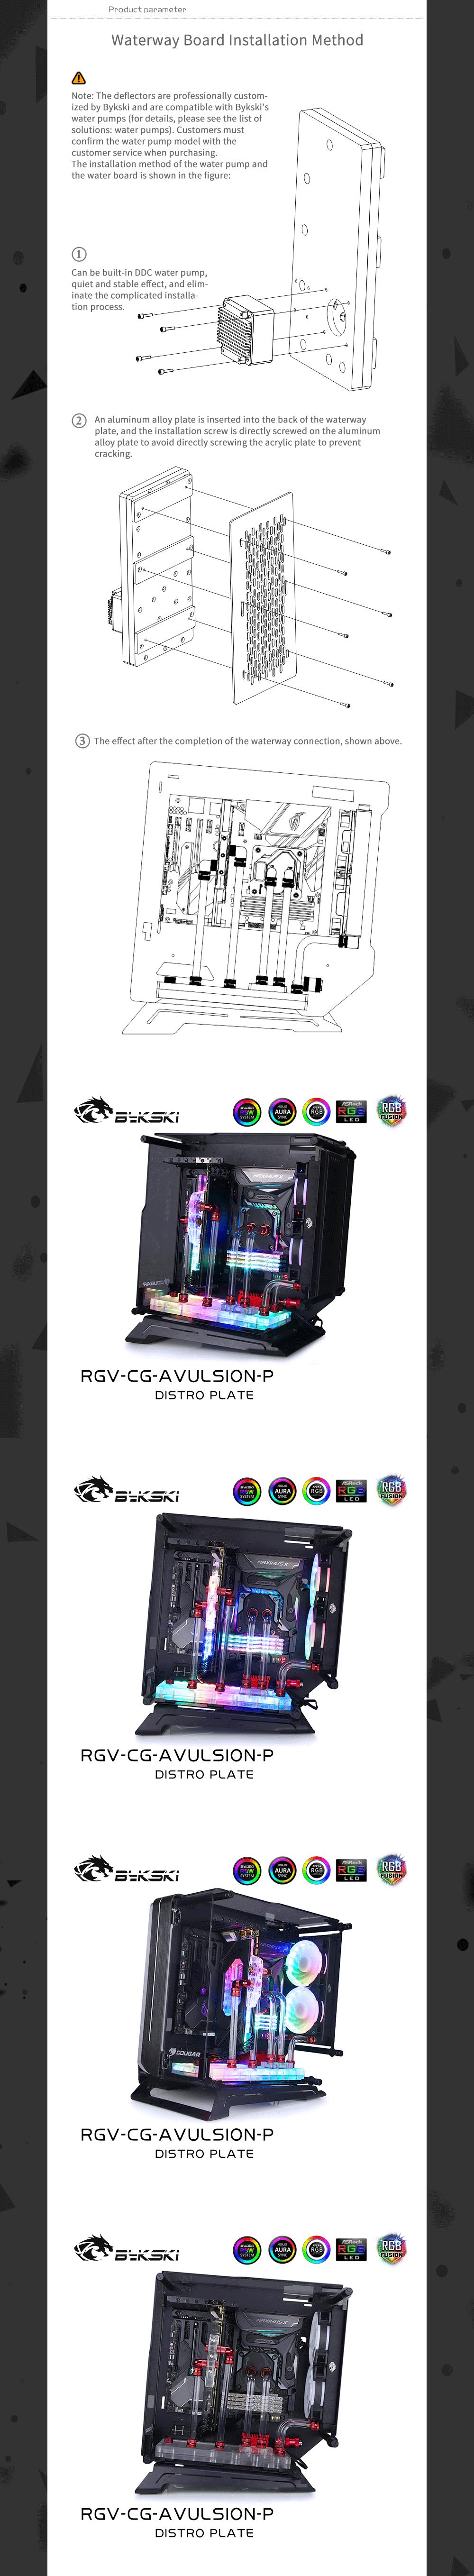 Bykski RGV-CG-AVULSION-P, Waterway Boards For Cougar Avulsion Case, For Intel CPU Water Block & Single GPU Building